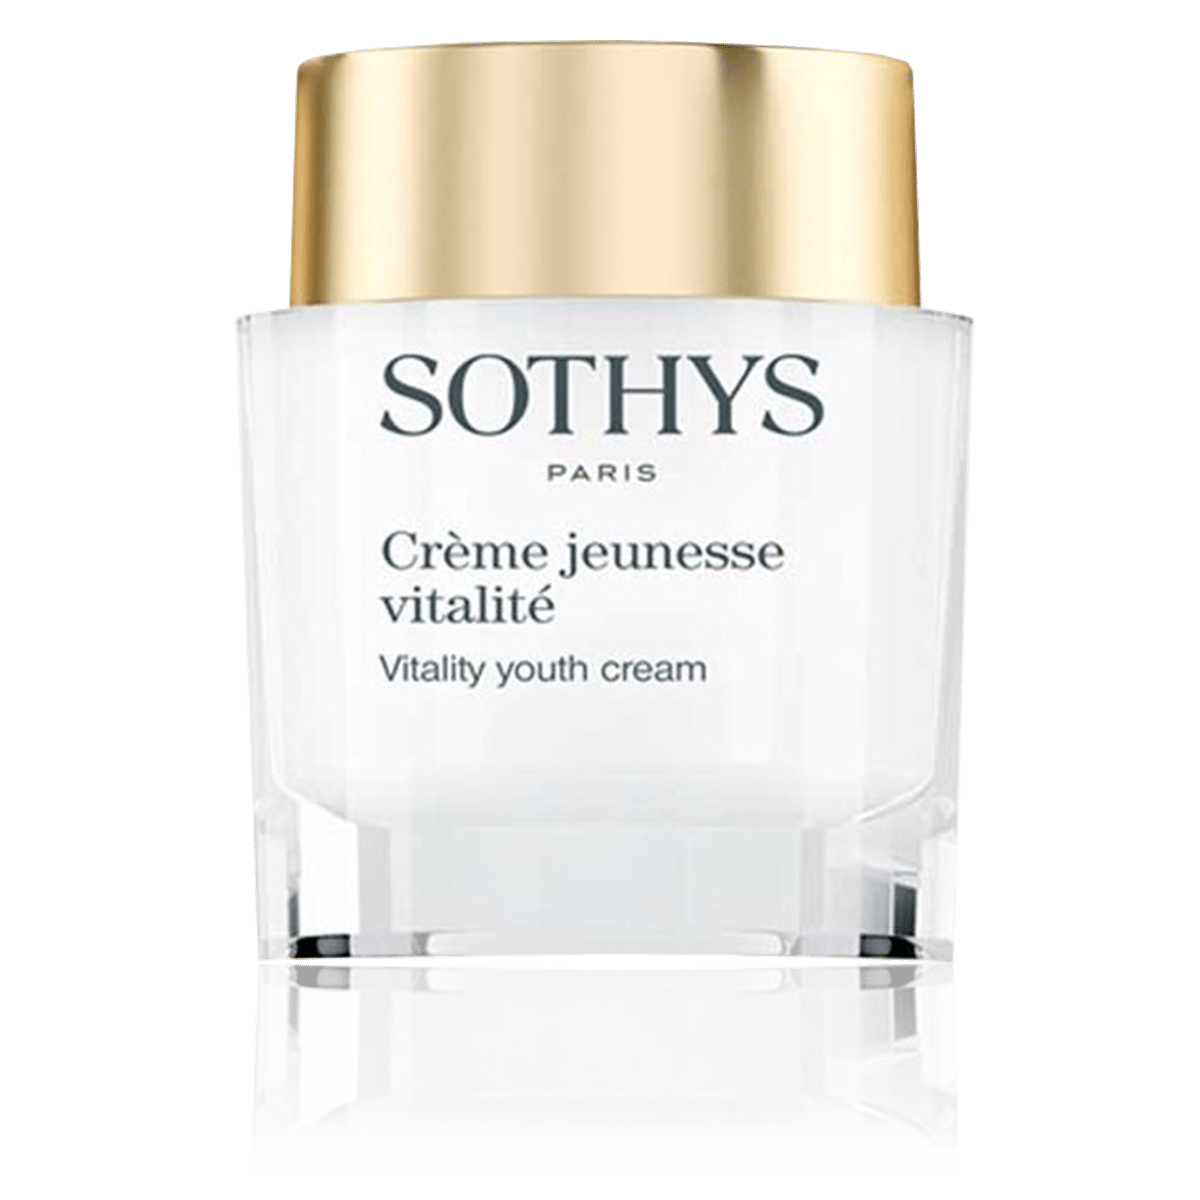 crema-jeunesse-vitalite-tratamiento-facial-madrid